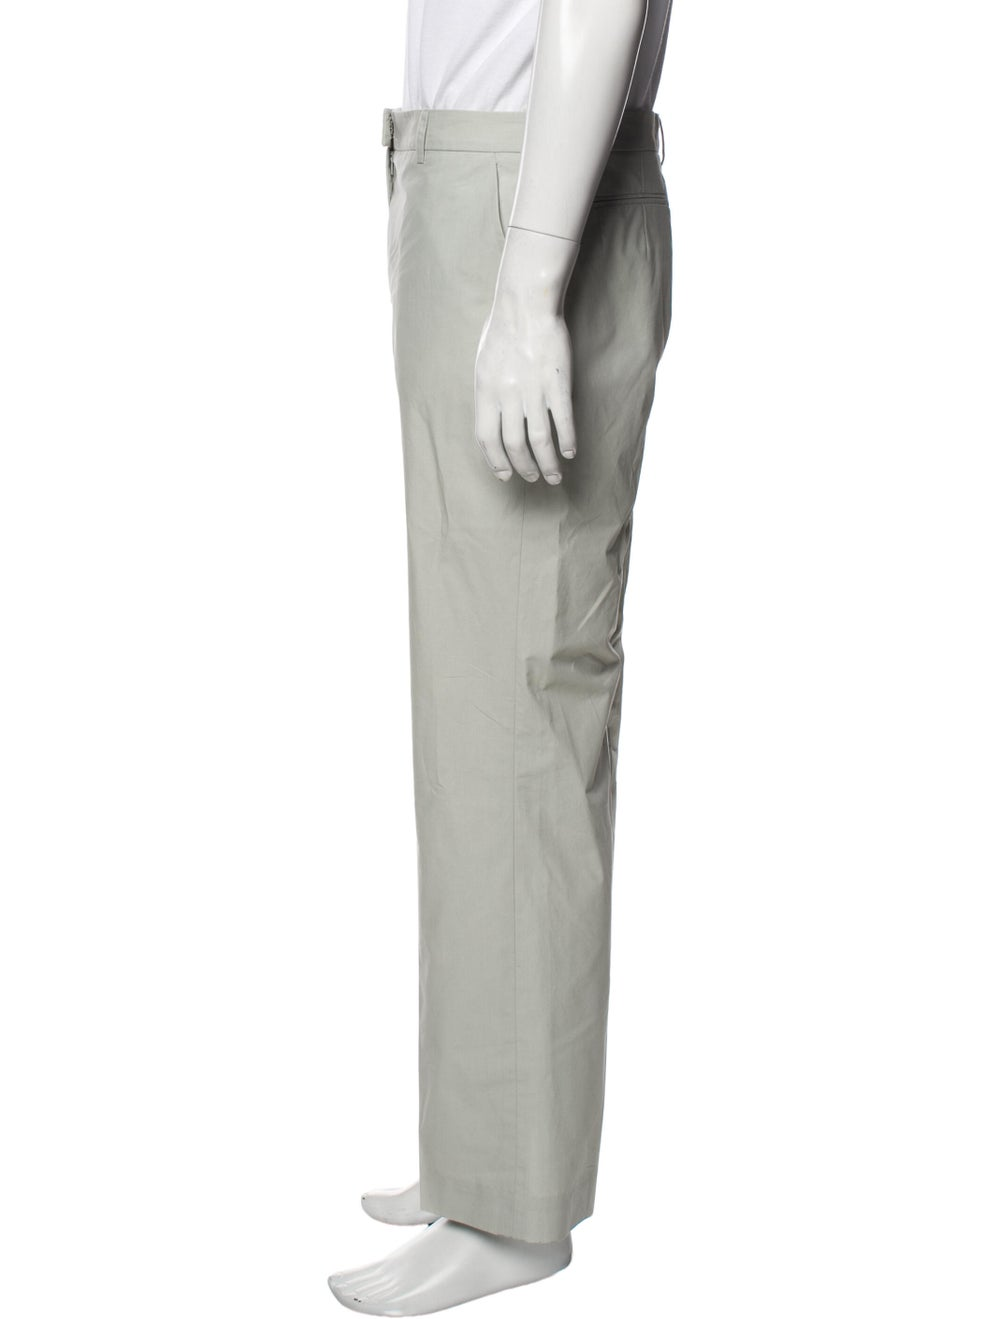 Asprey Pants Green - image 2